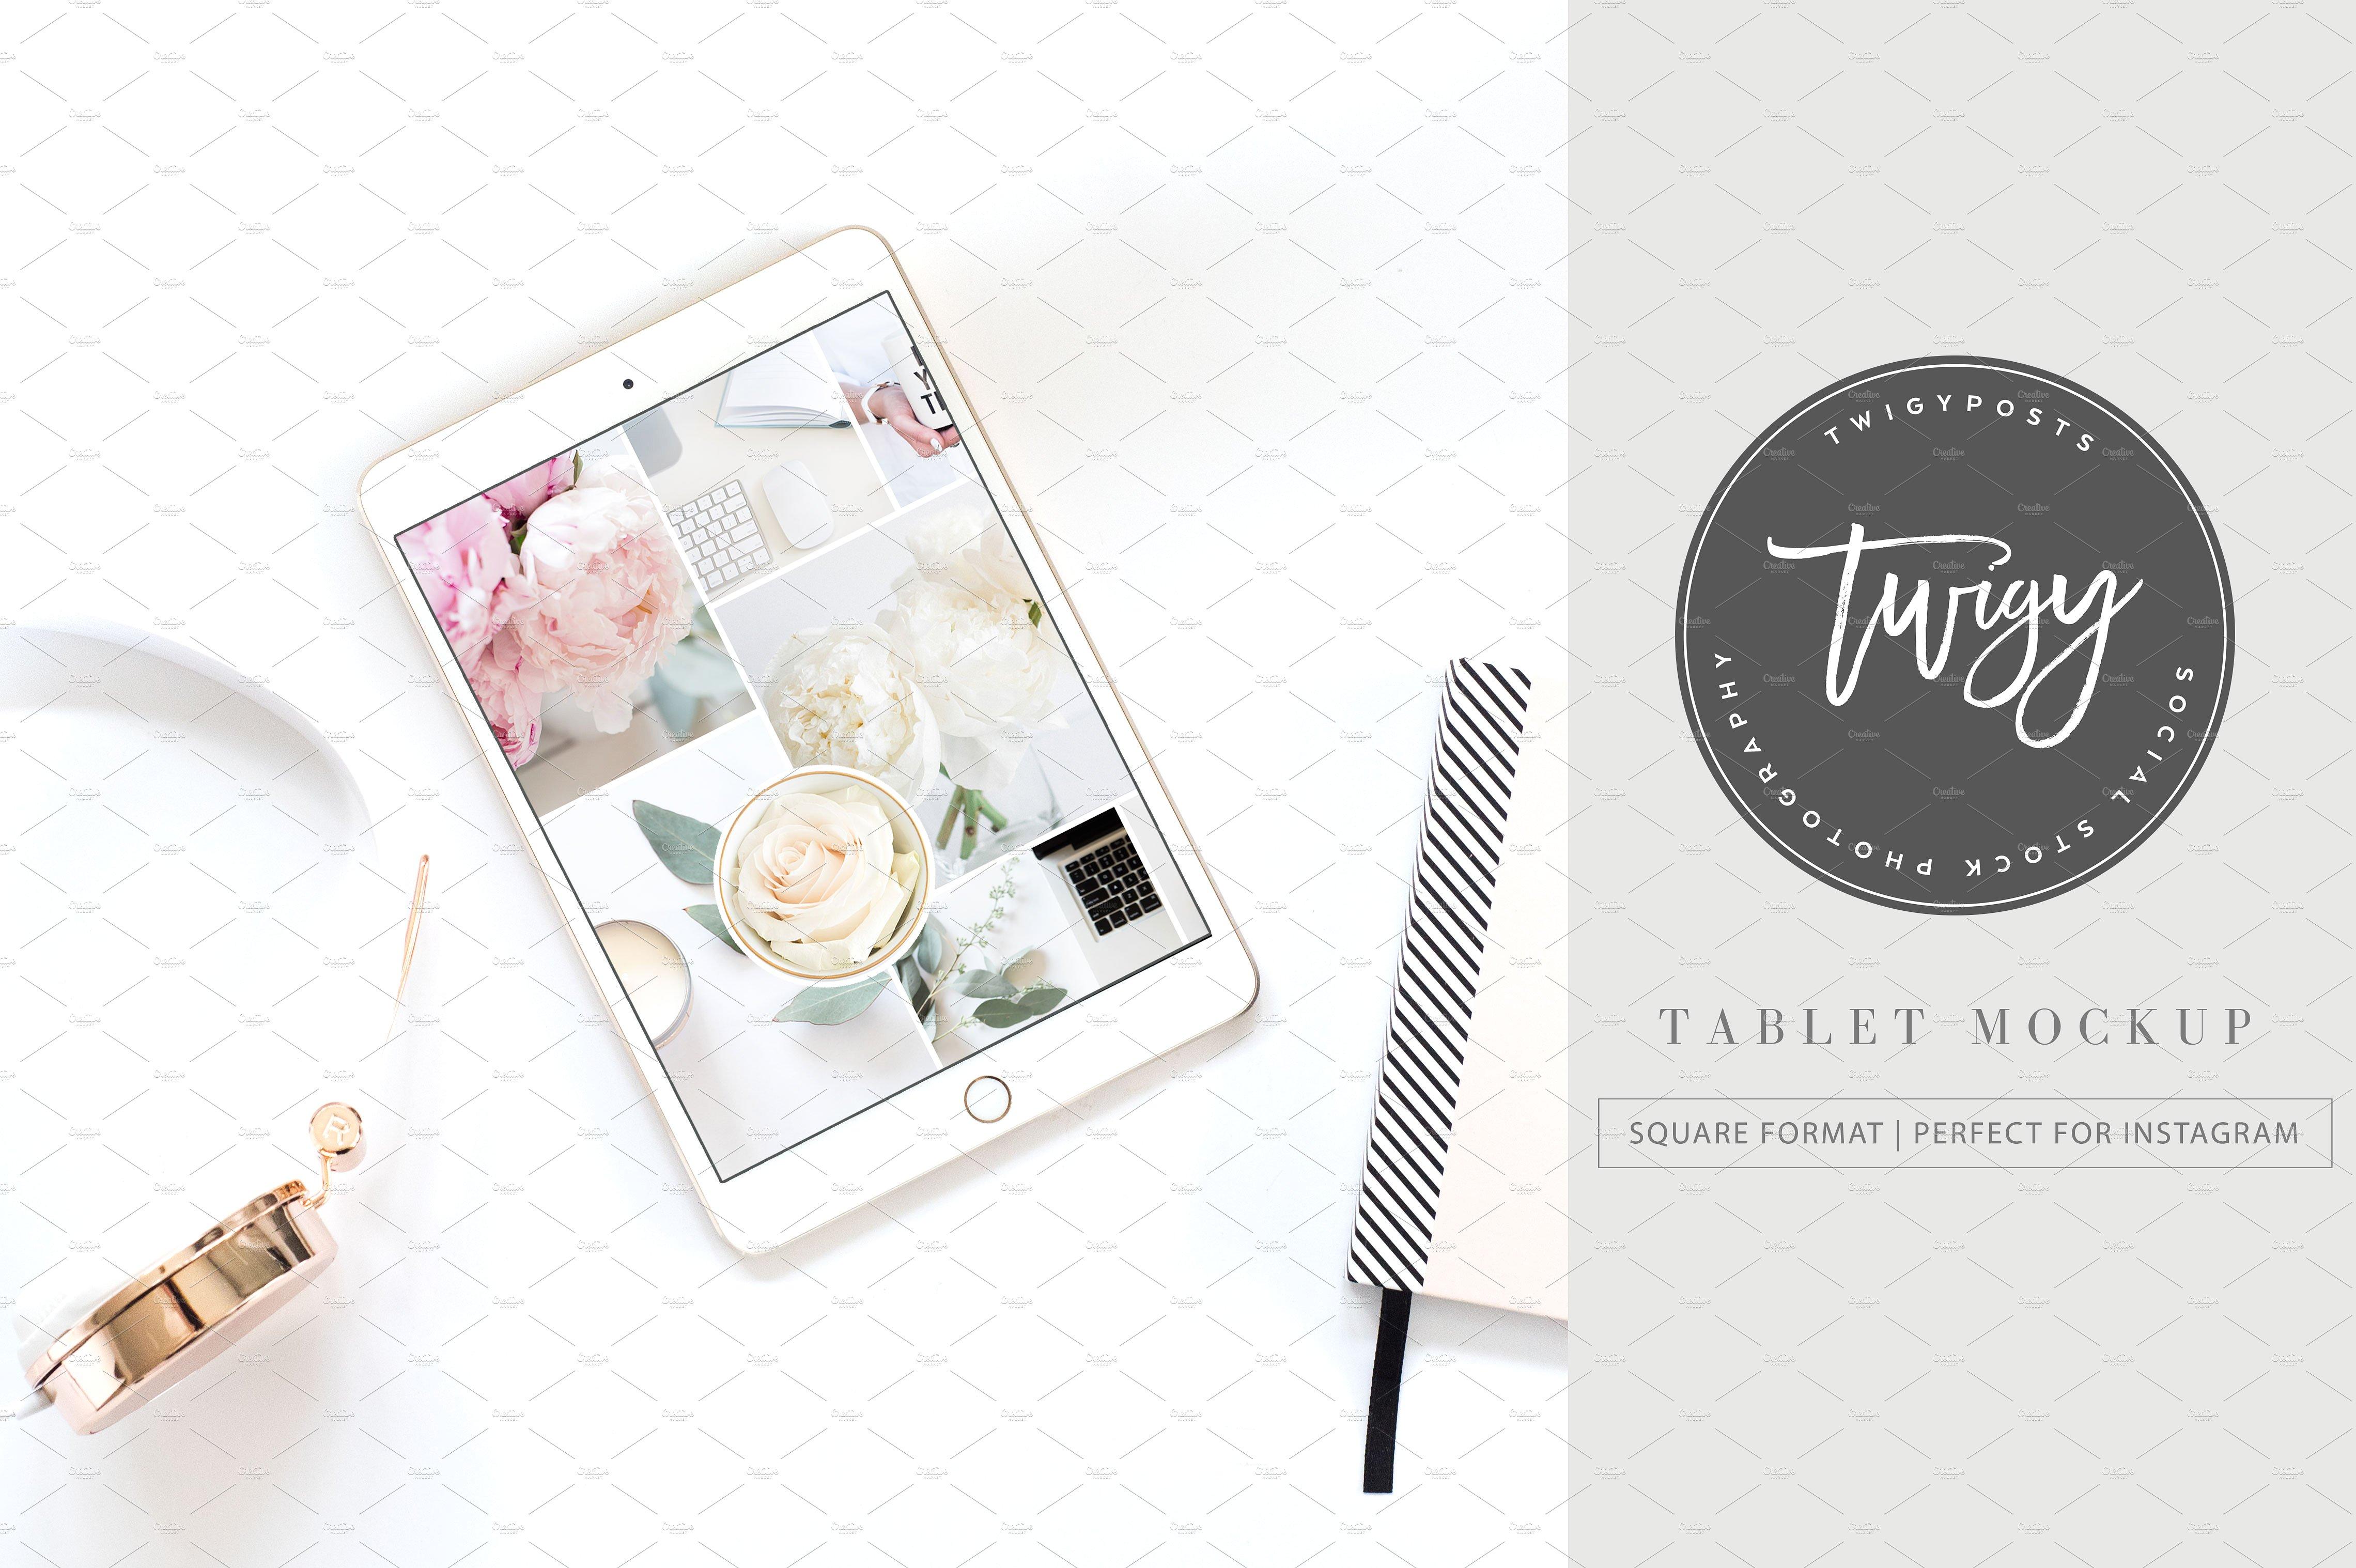 tabletmockupcmcover-1-1.jpg